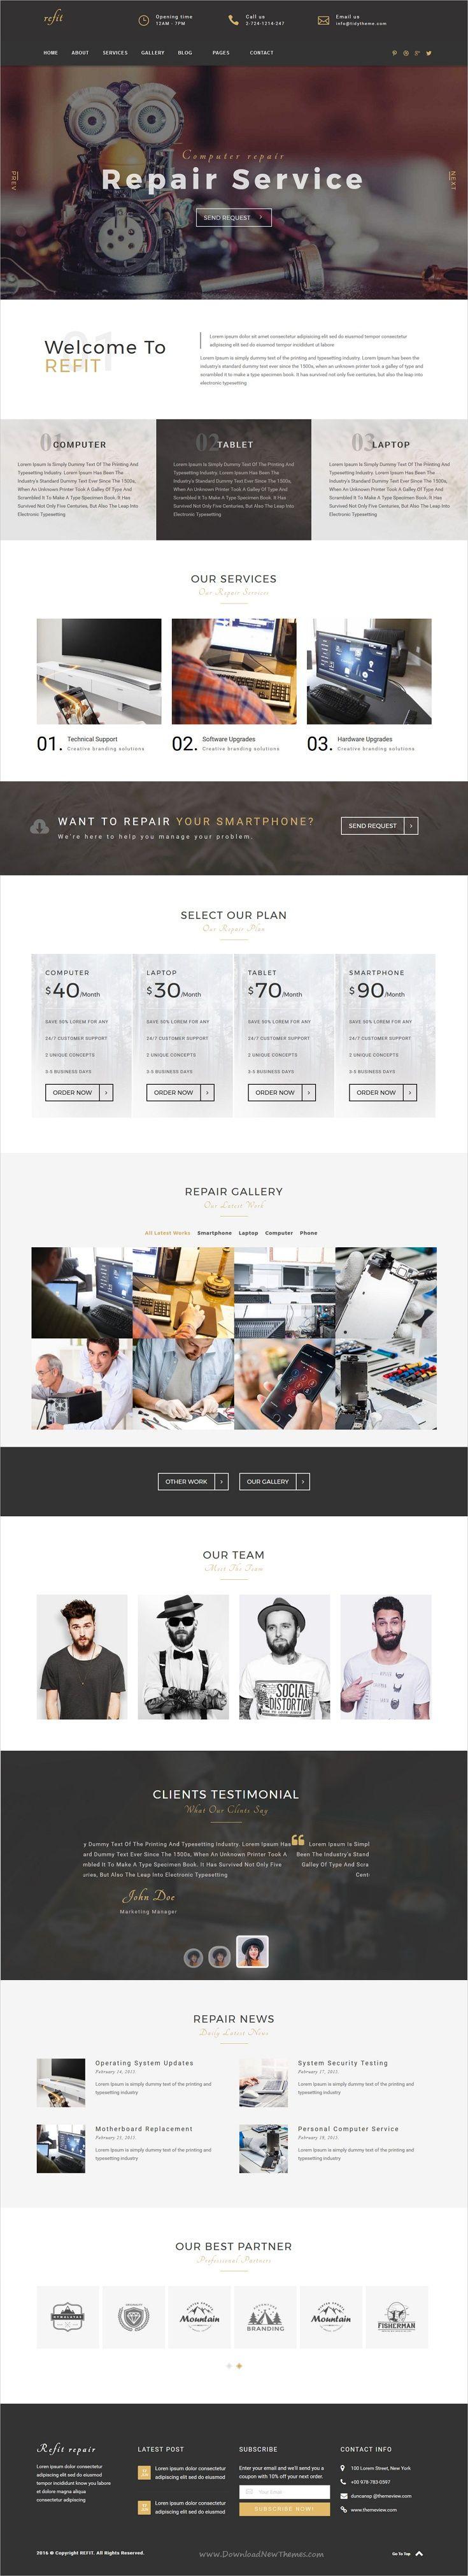 Refit is beautiful responsive #HTML #bootstrap template for phone, computer #repair shop websites download now➩ https://themeforest.net/item/refit-phone-computer-repair-shop-html-template/19354309?ref=Datasata